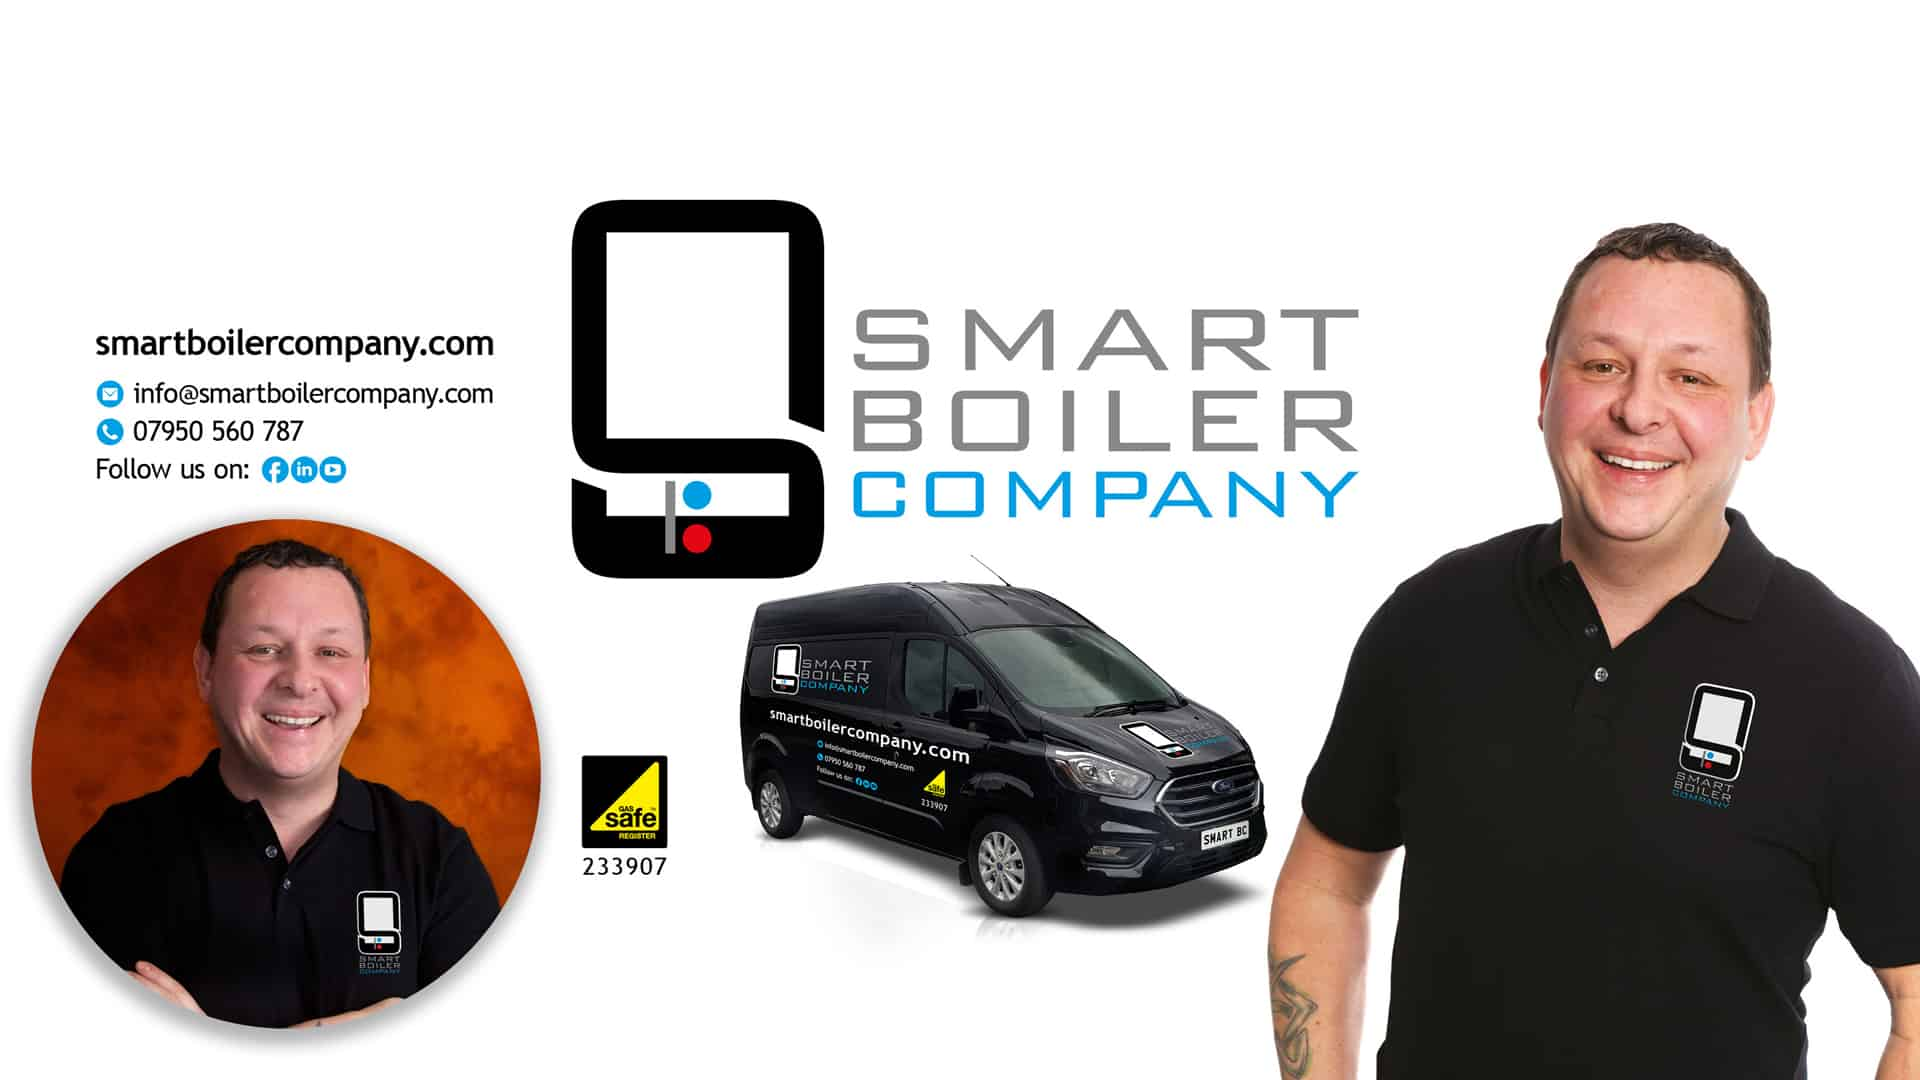 Smart Boiler Image 3